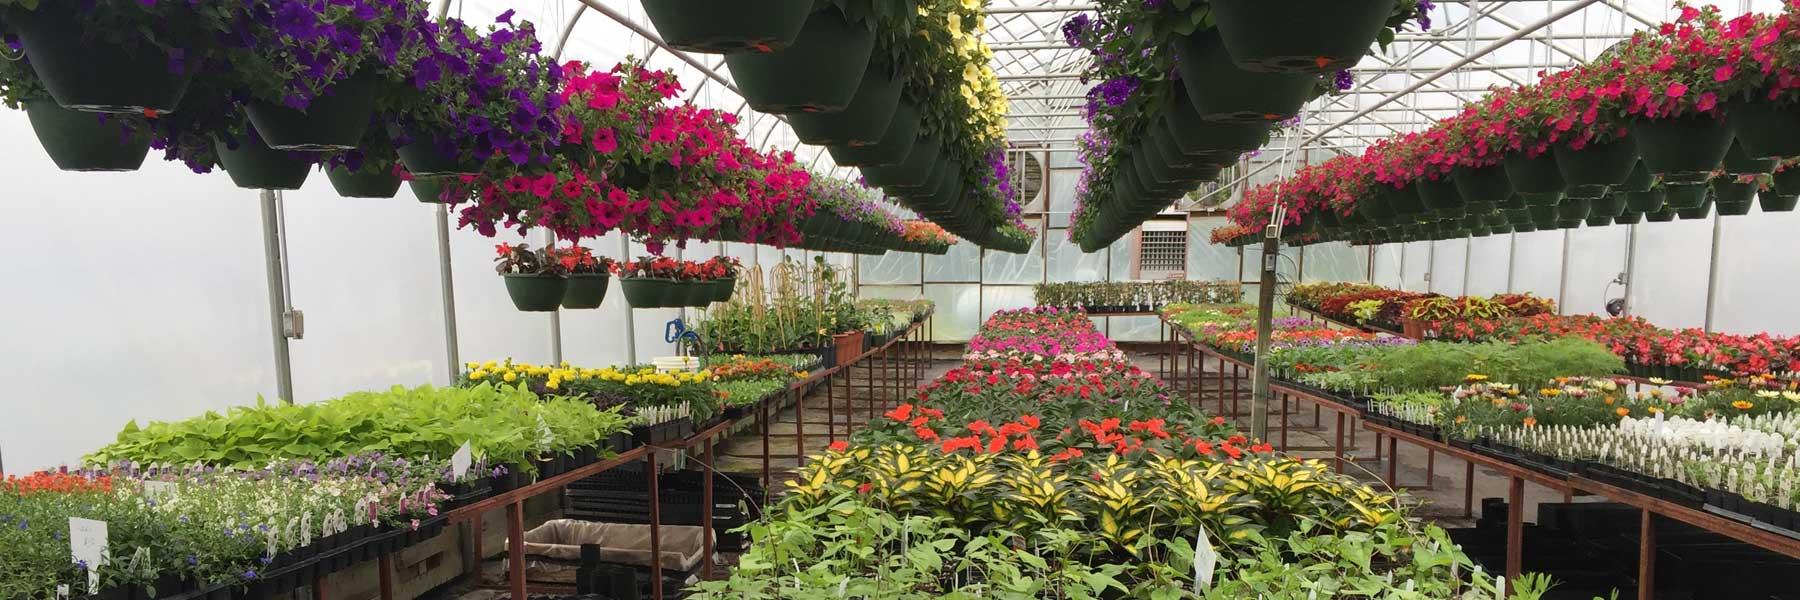 pisgah greenhouse